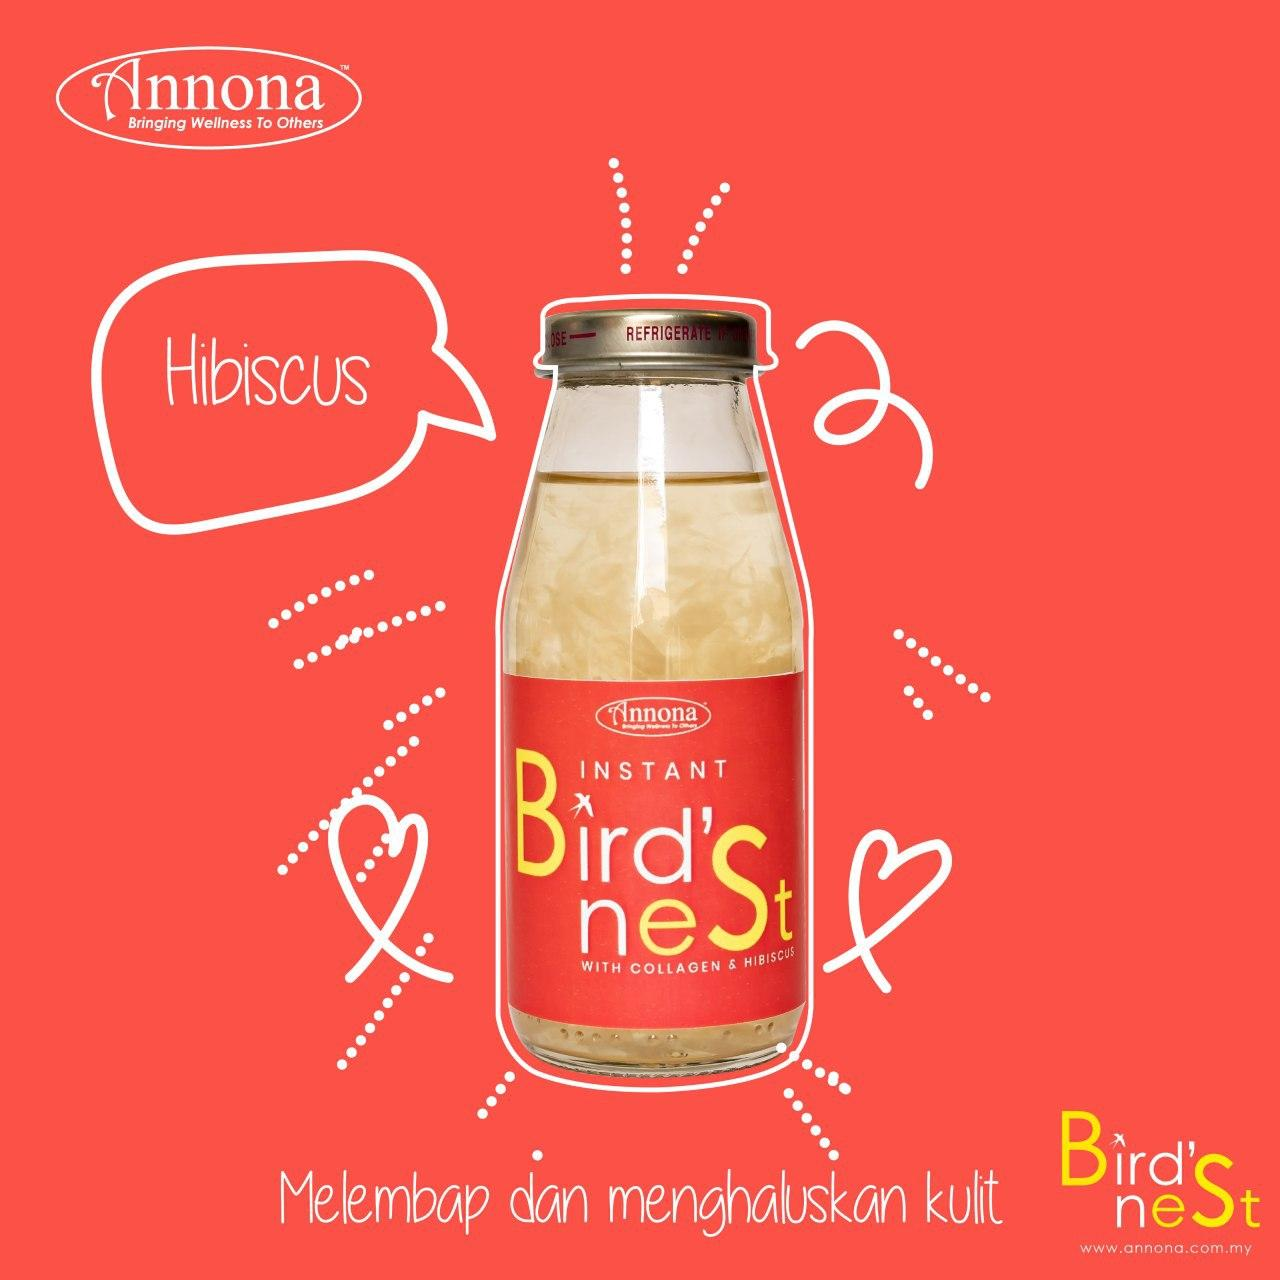 ANNONA Instant Bird